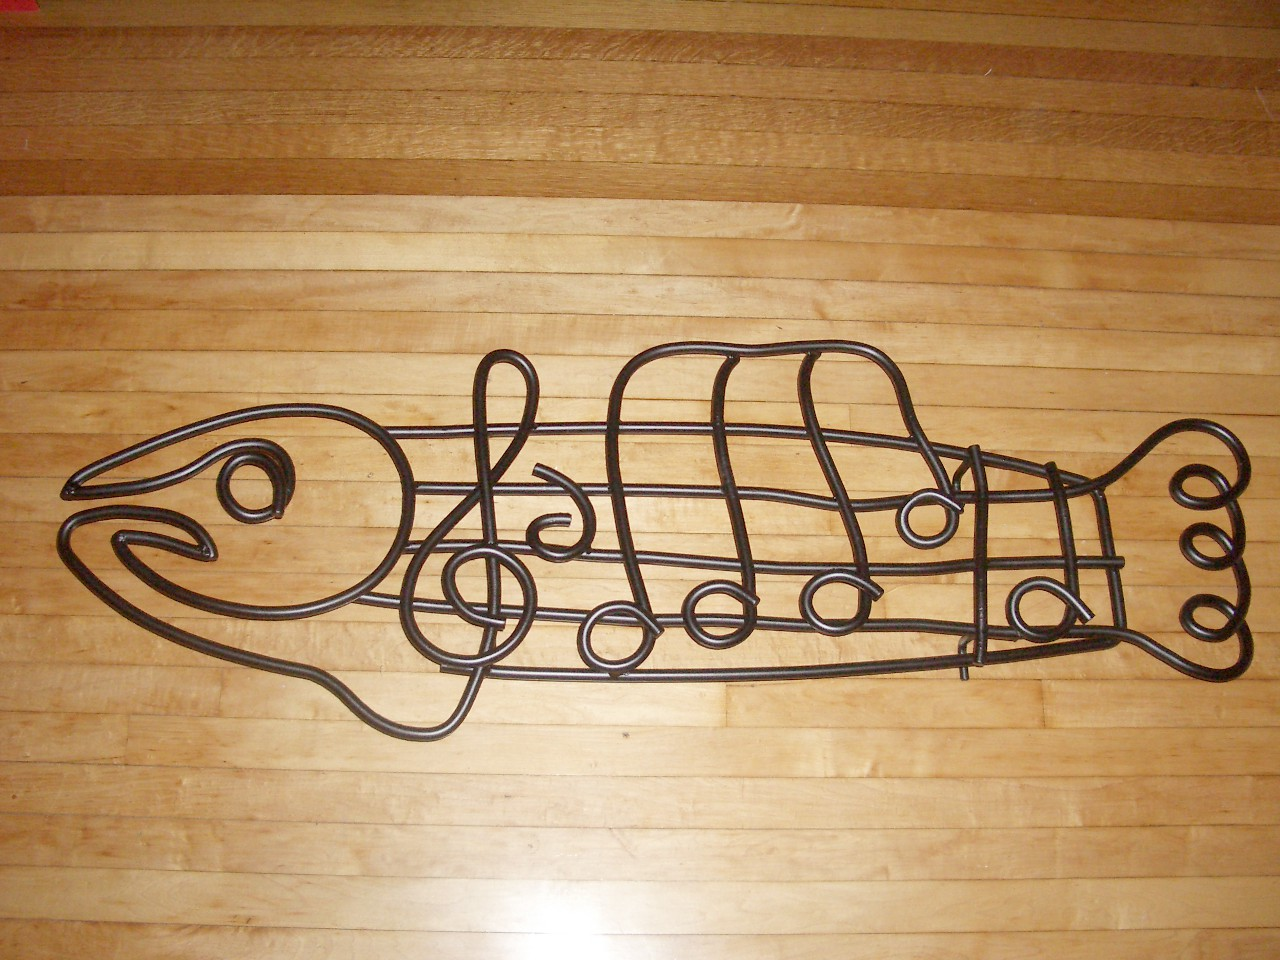 monkfish_sign